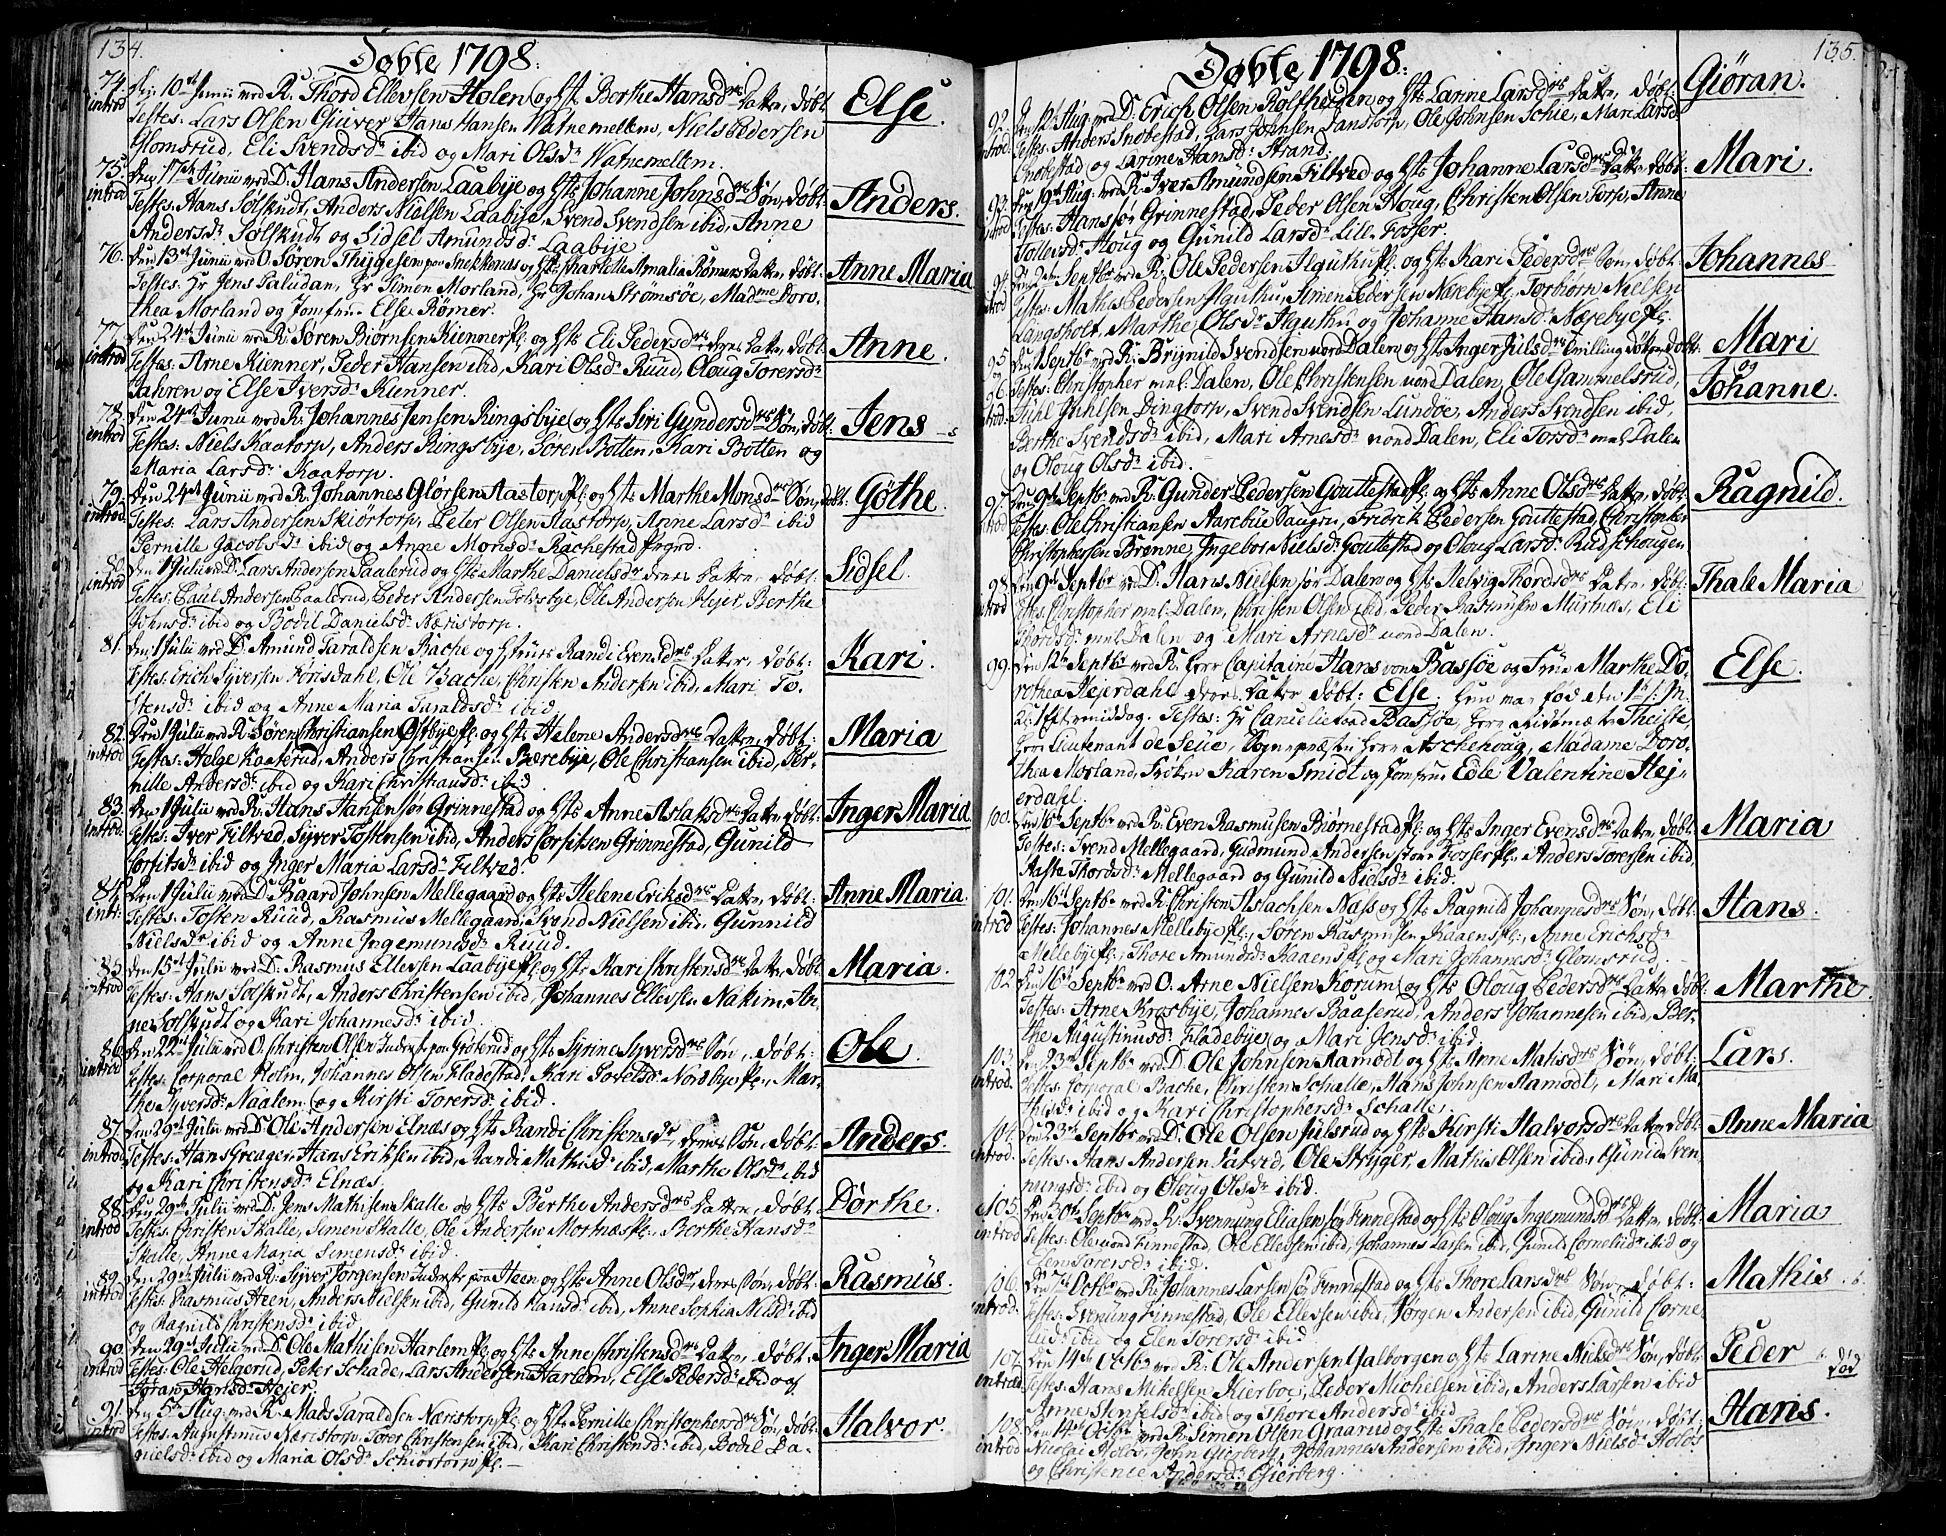 SAO, Rakkestad prestekontor Kirkebøker, F/Fa/L0005: Ministerialbok nr. I 5, 1784-1814, s. 134-135